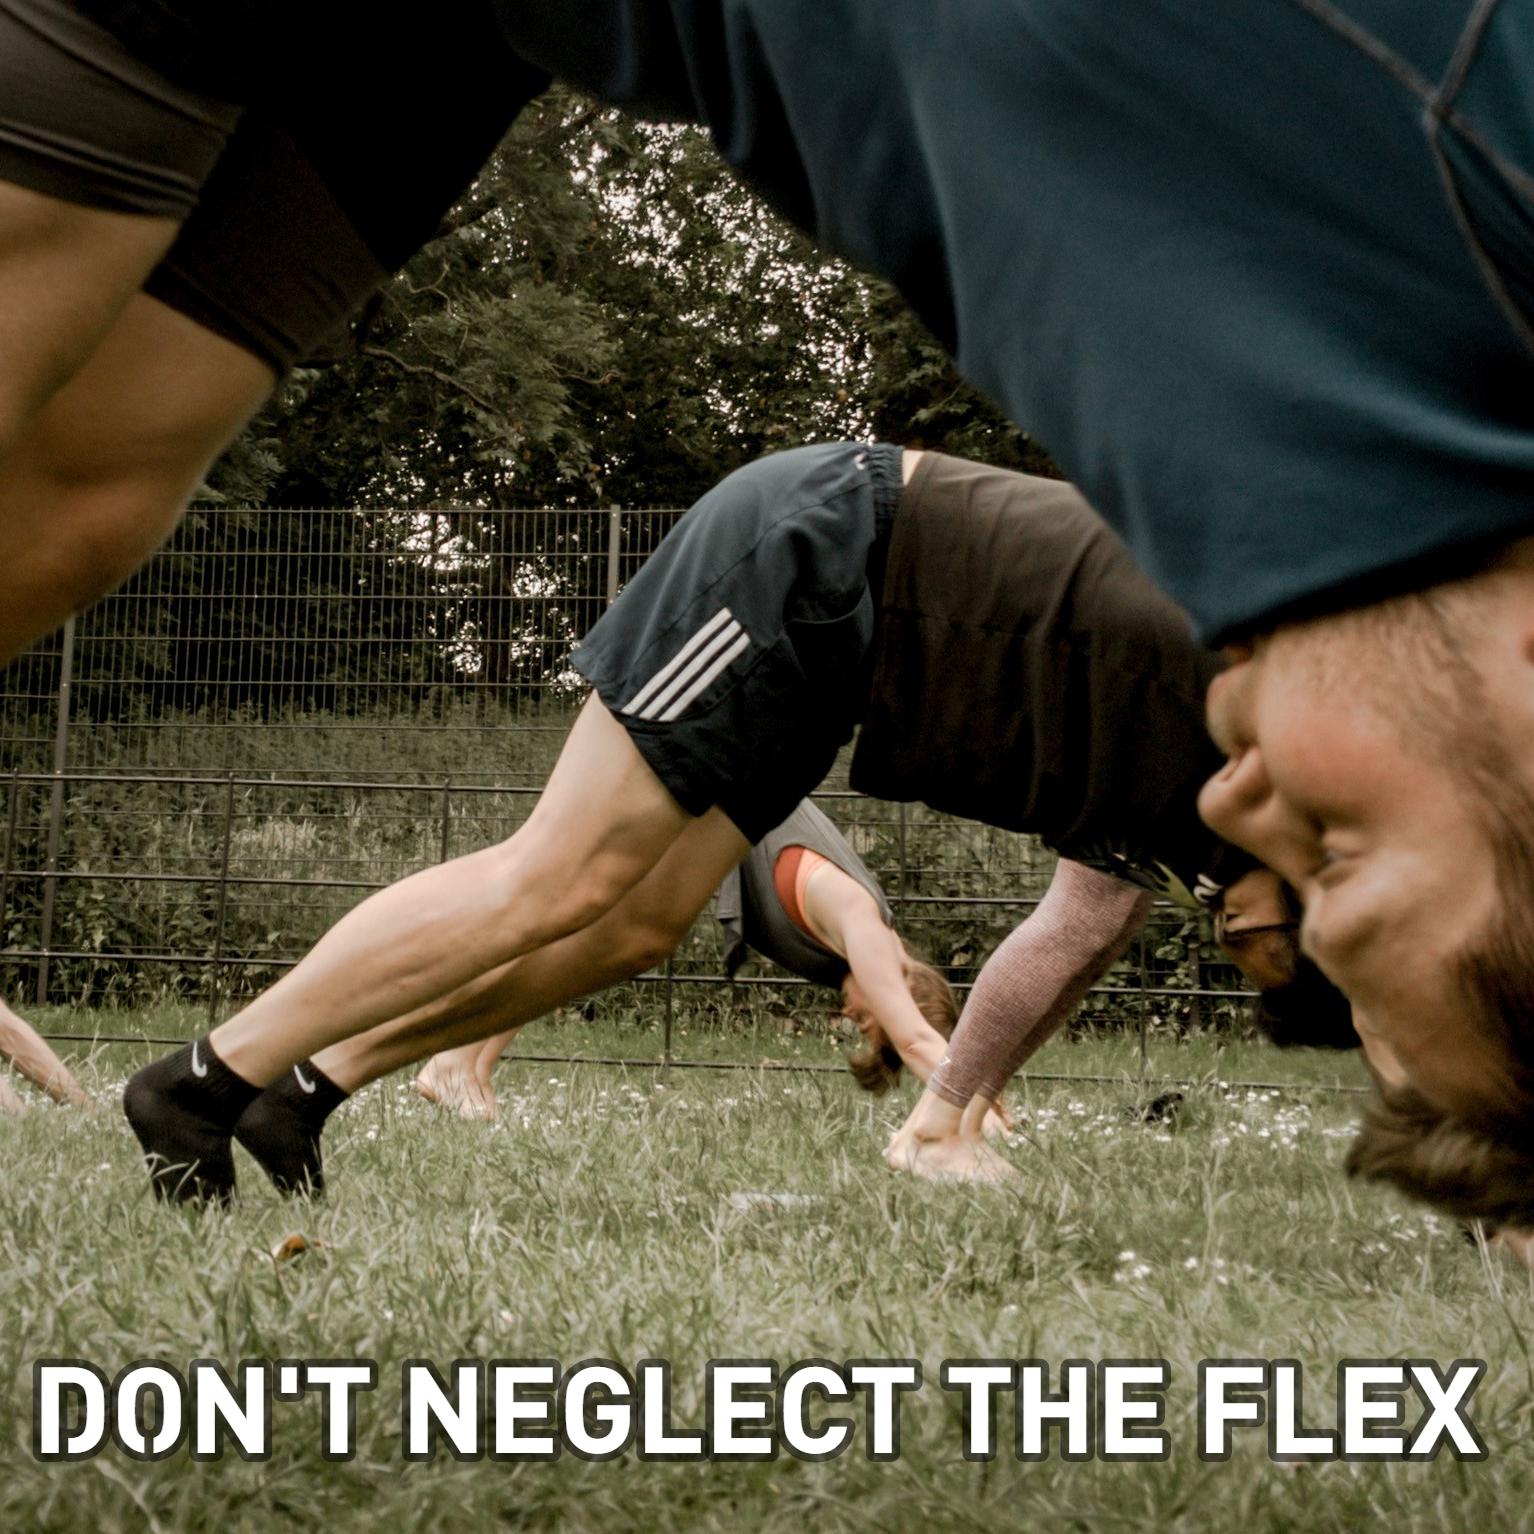 dont_neglect_the_flex_JC.jpg